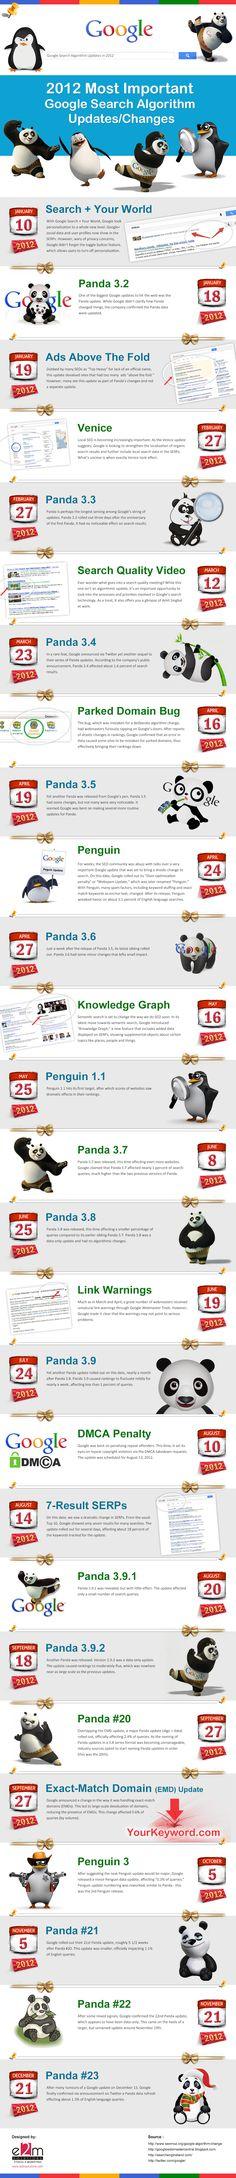 Google Search Algorithm Updates 2012